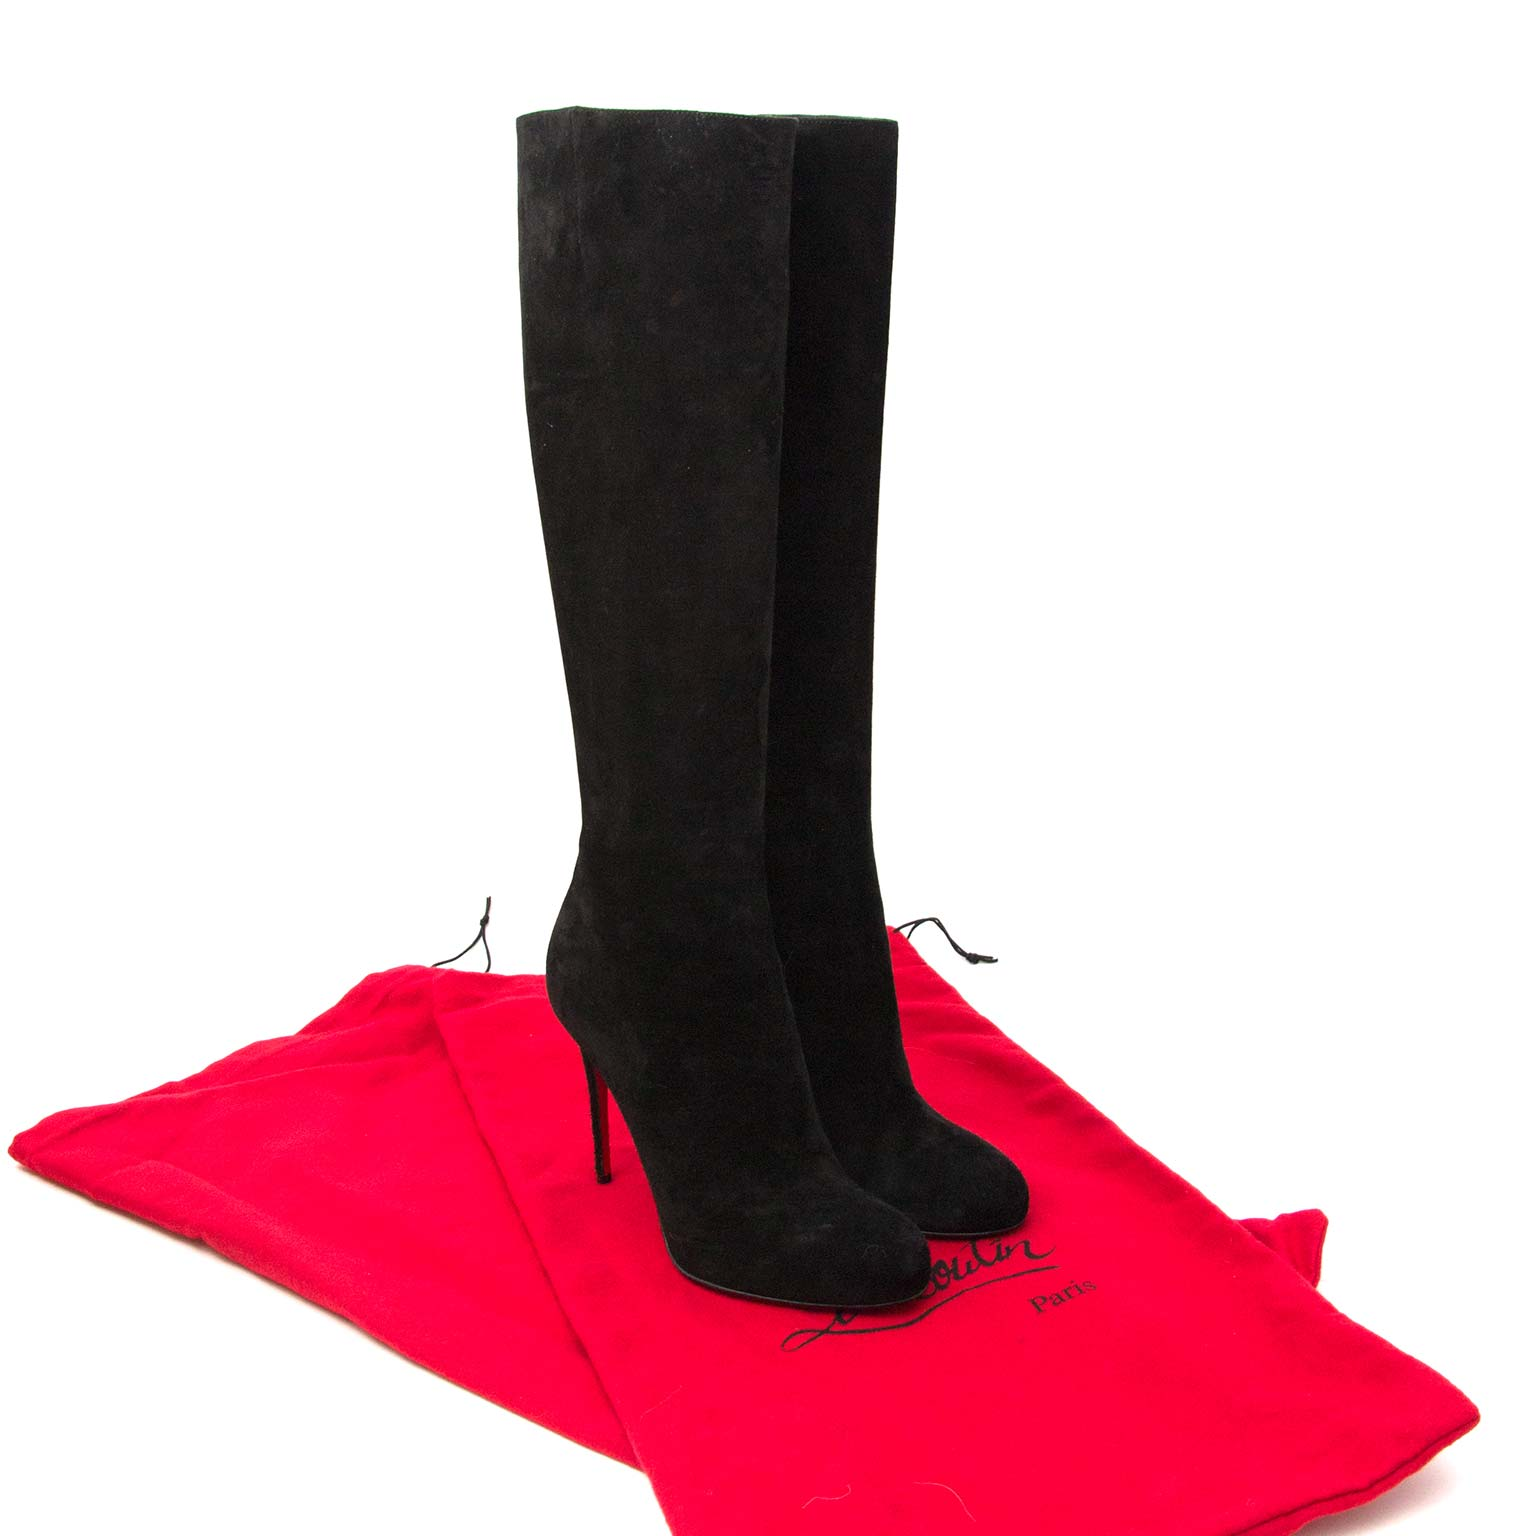 b5f55013efc Labellov Buy authentic vintagePrada designer bags, shoes, clothes ...